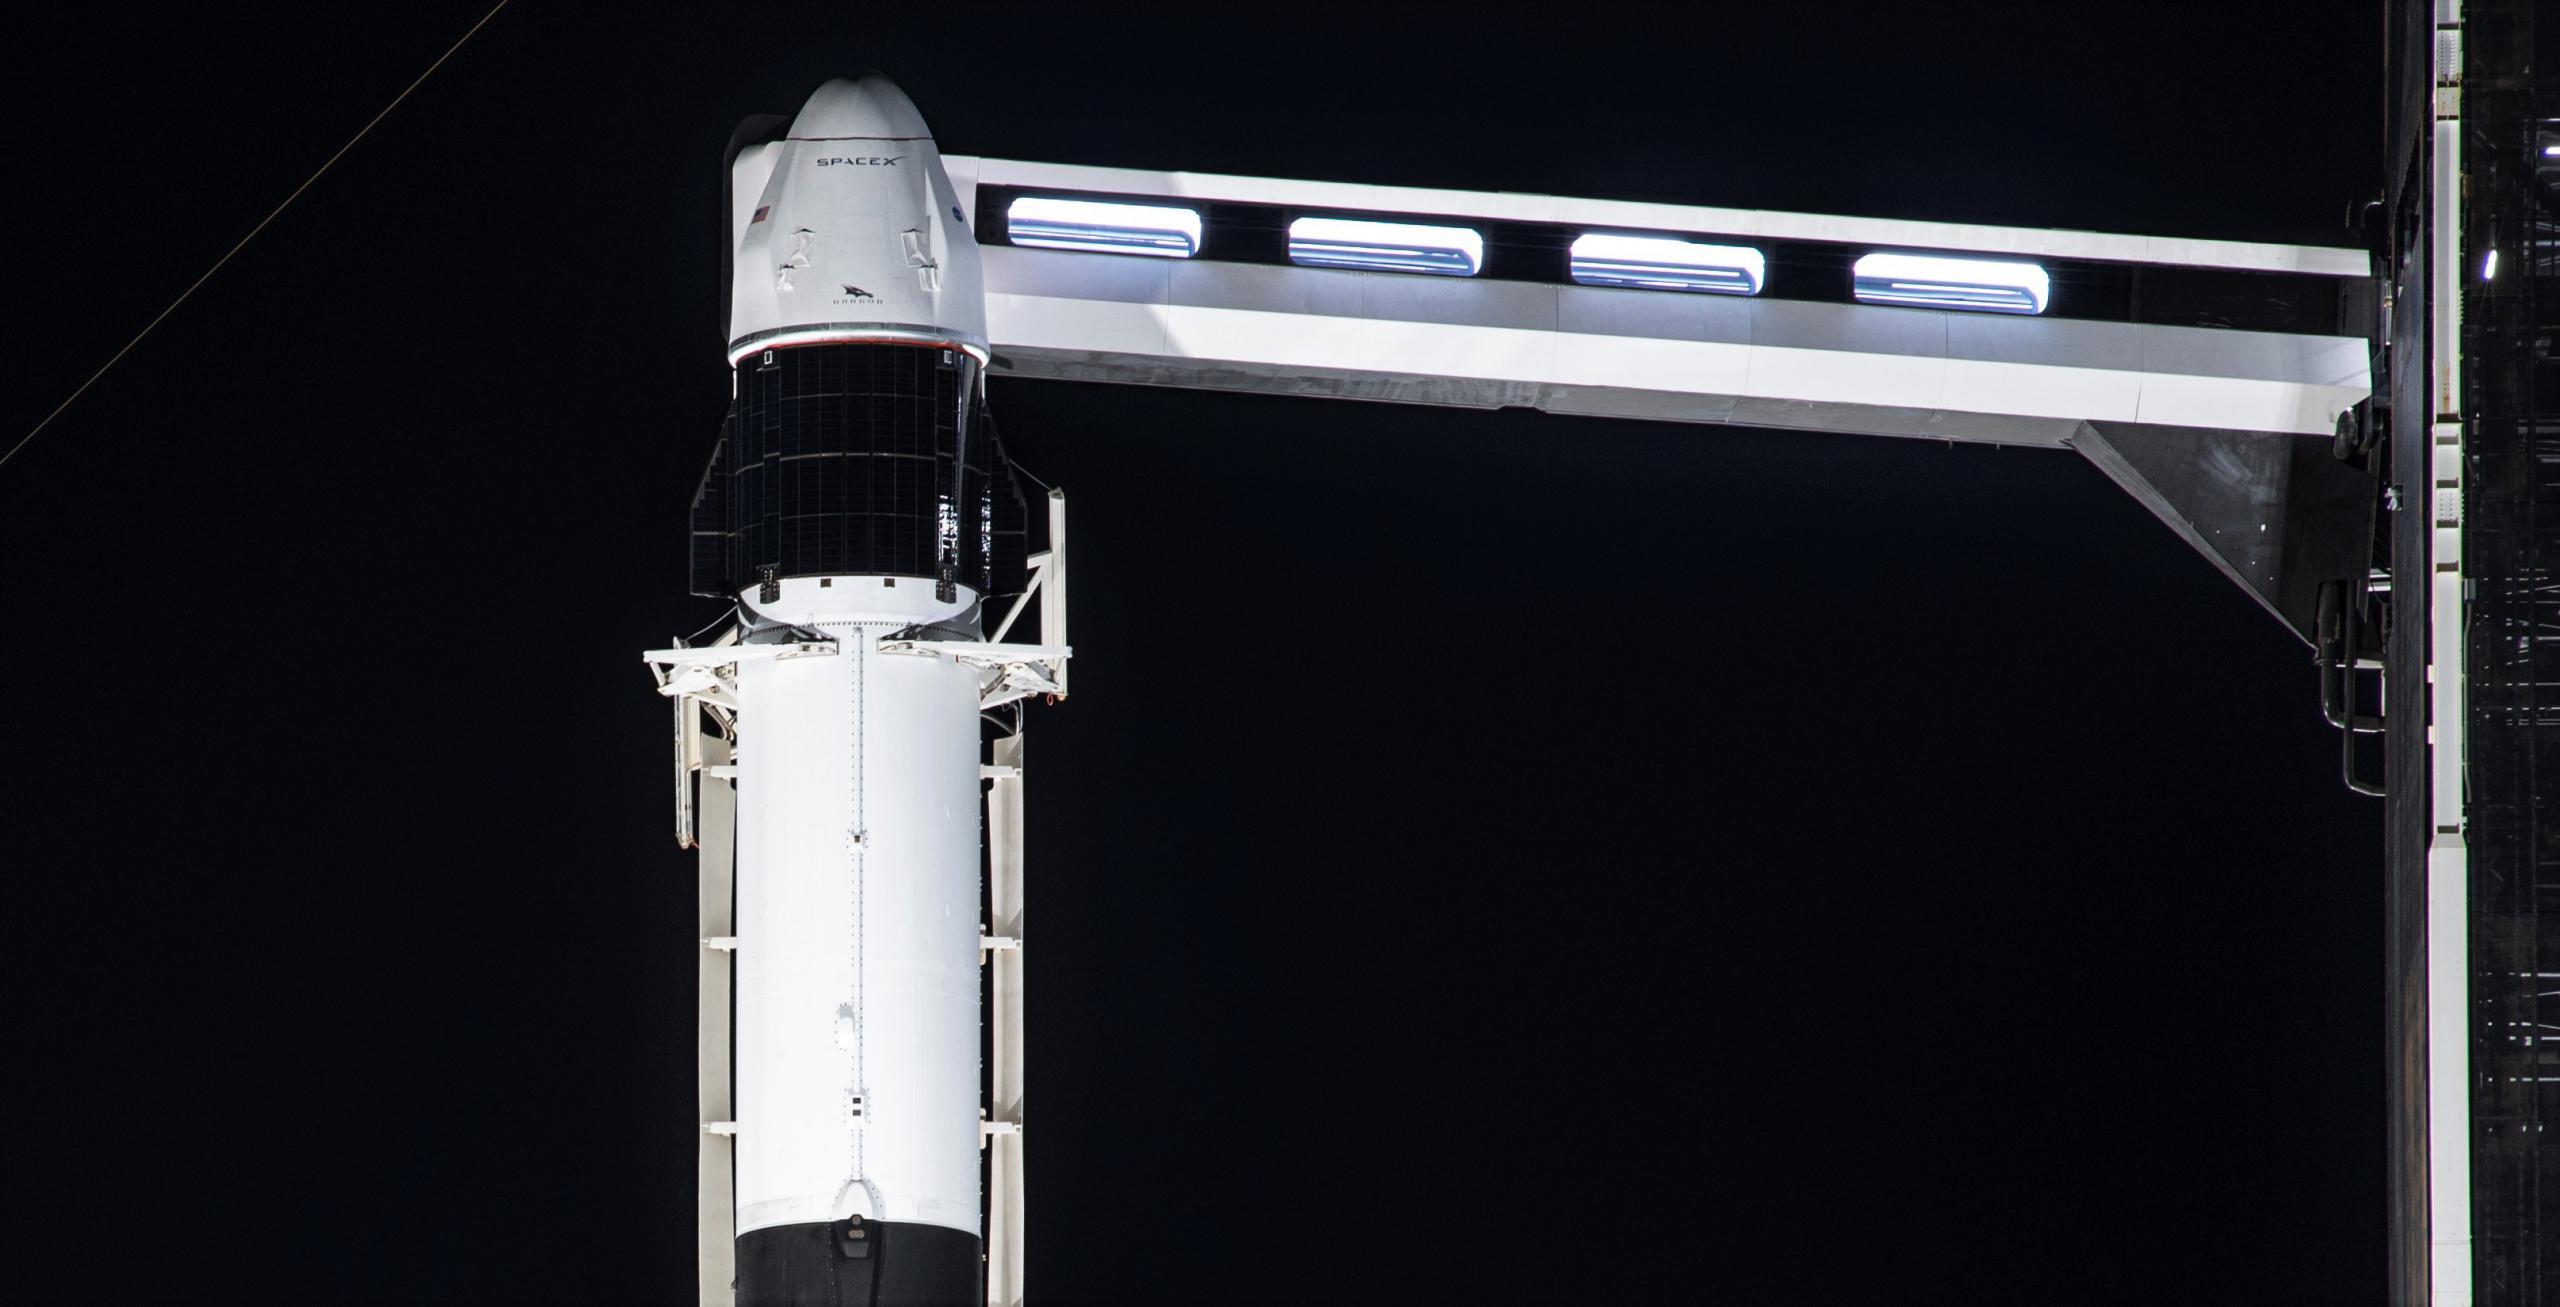 CRS-21 Cargo Dragon 2 Falcon 9 B1058 120220 (SpaceX) vertical 2 crop 2 (c)